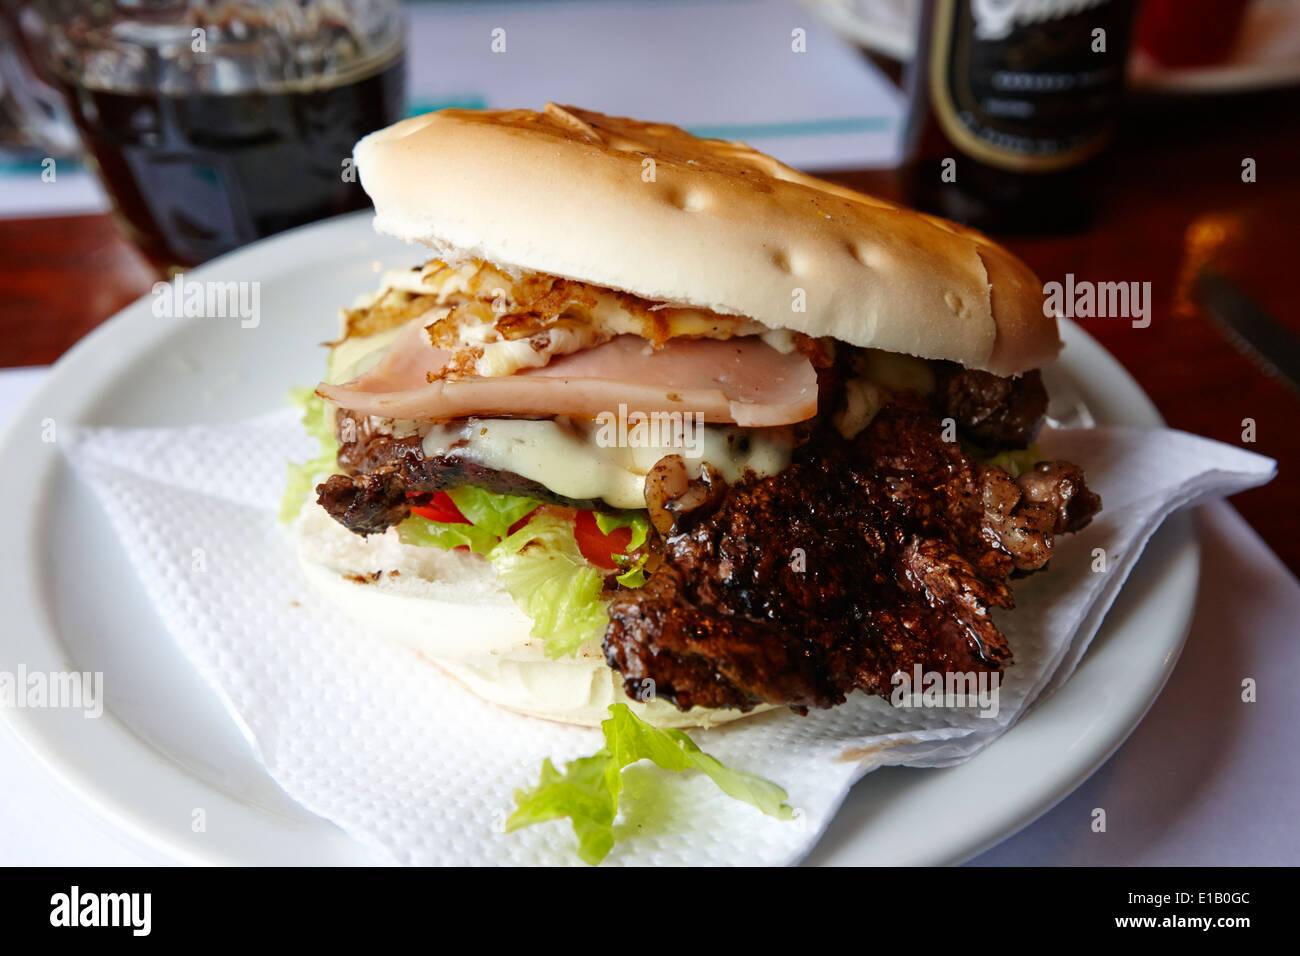 Hamburguesa Steak Sandwich Ushuaia, Argentinien Stockbild